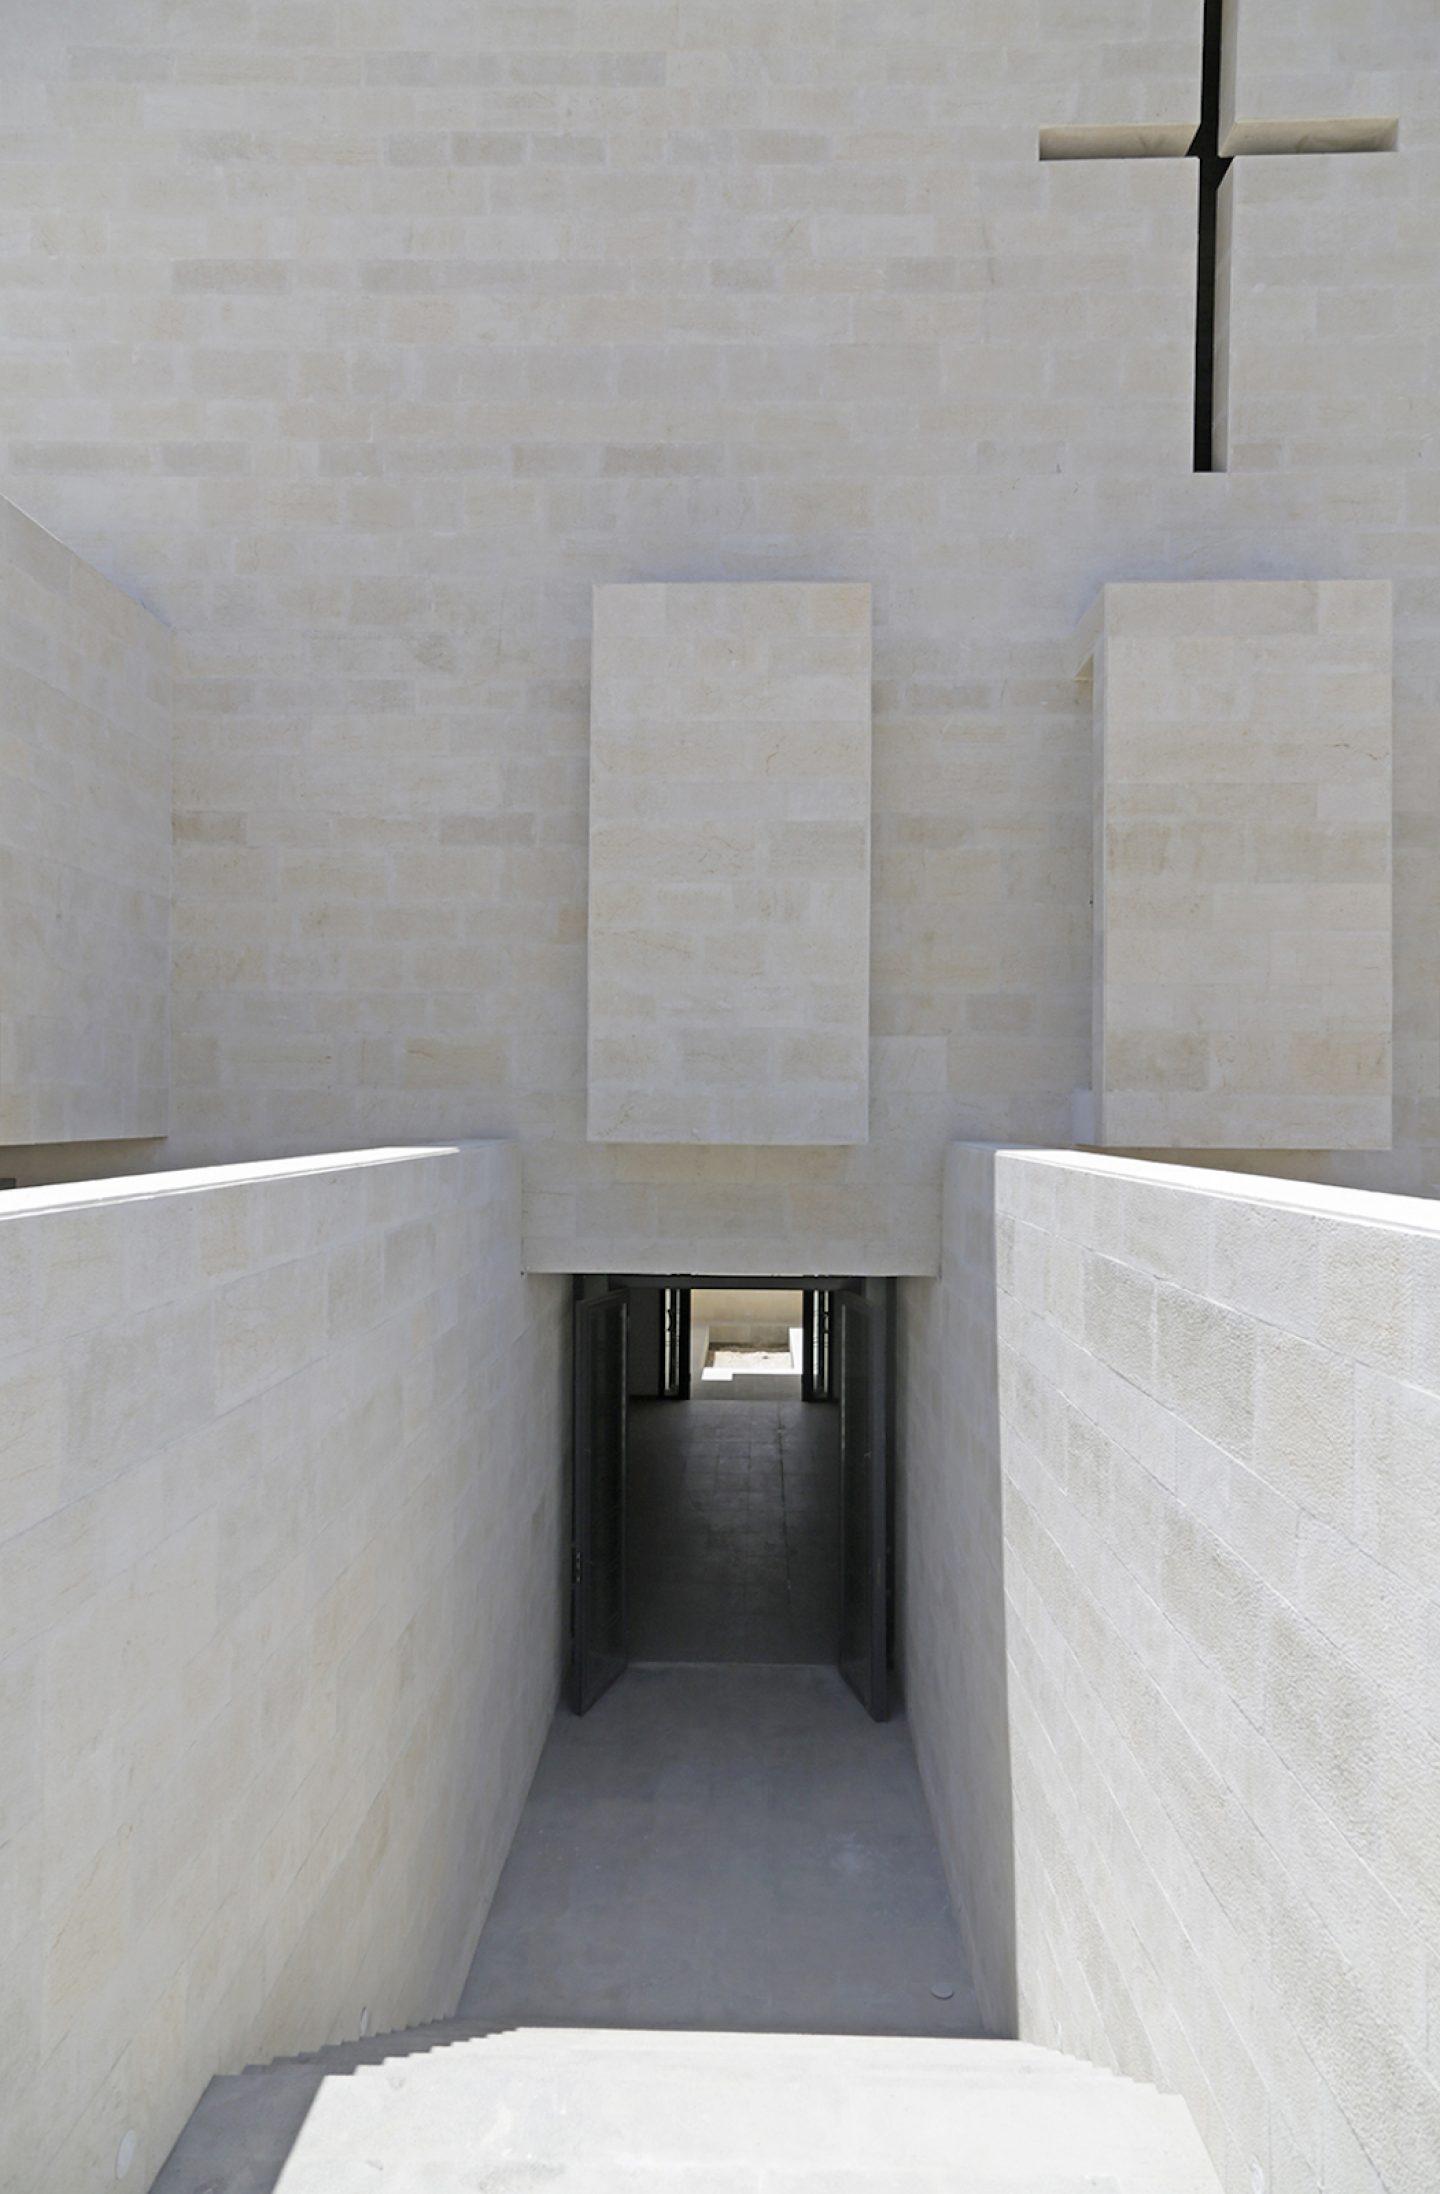 maron-lahoud_architecture_007